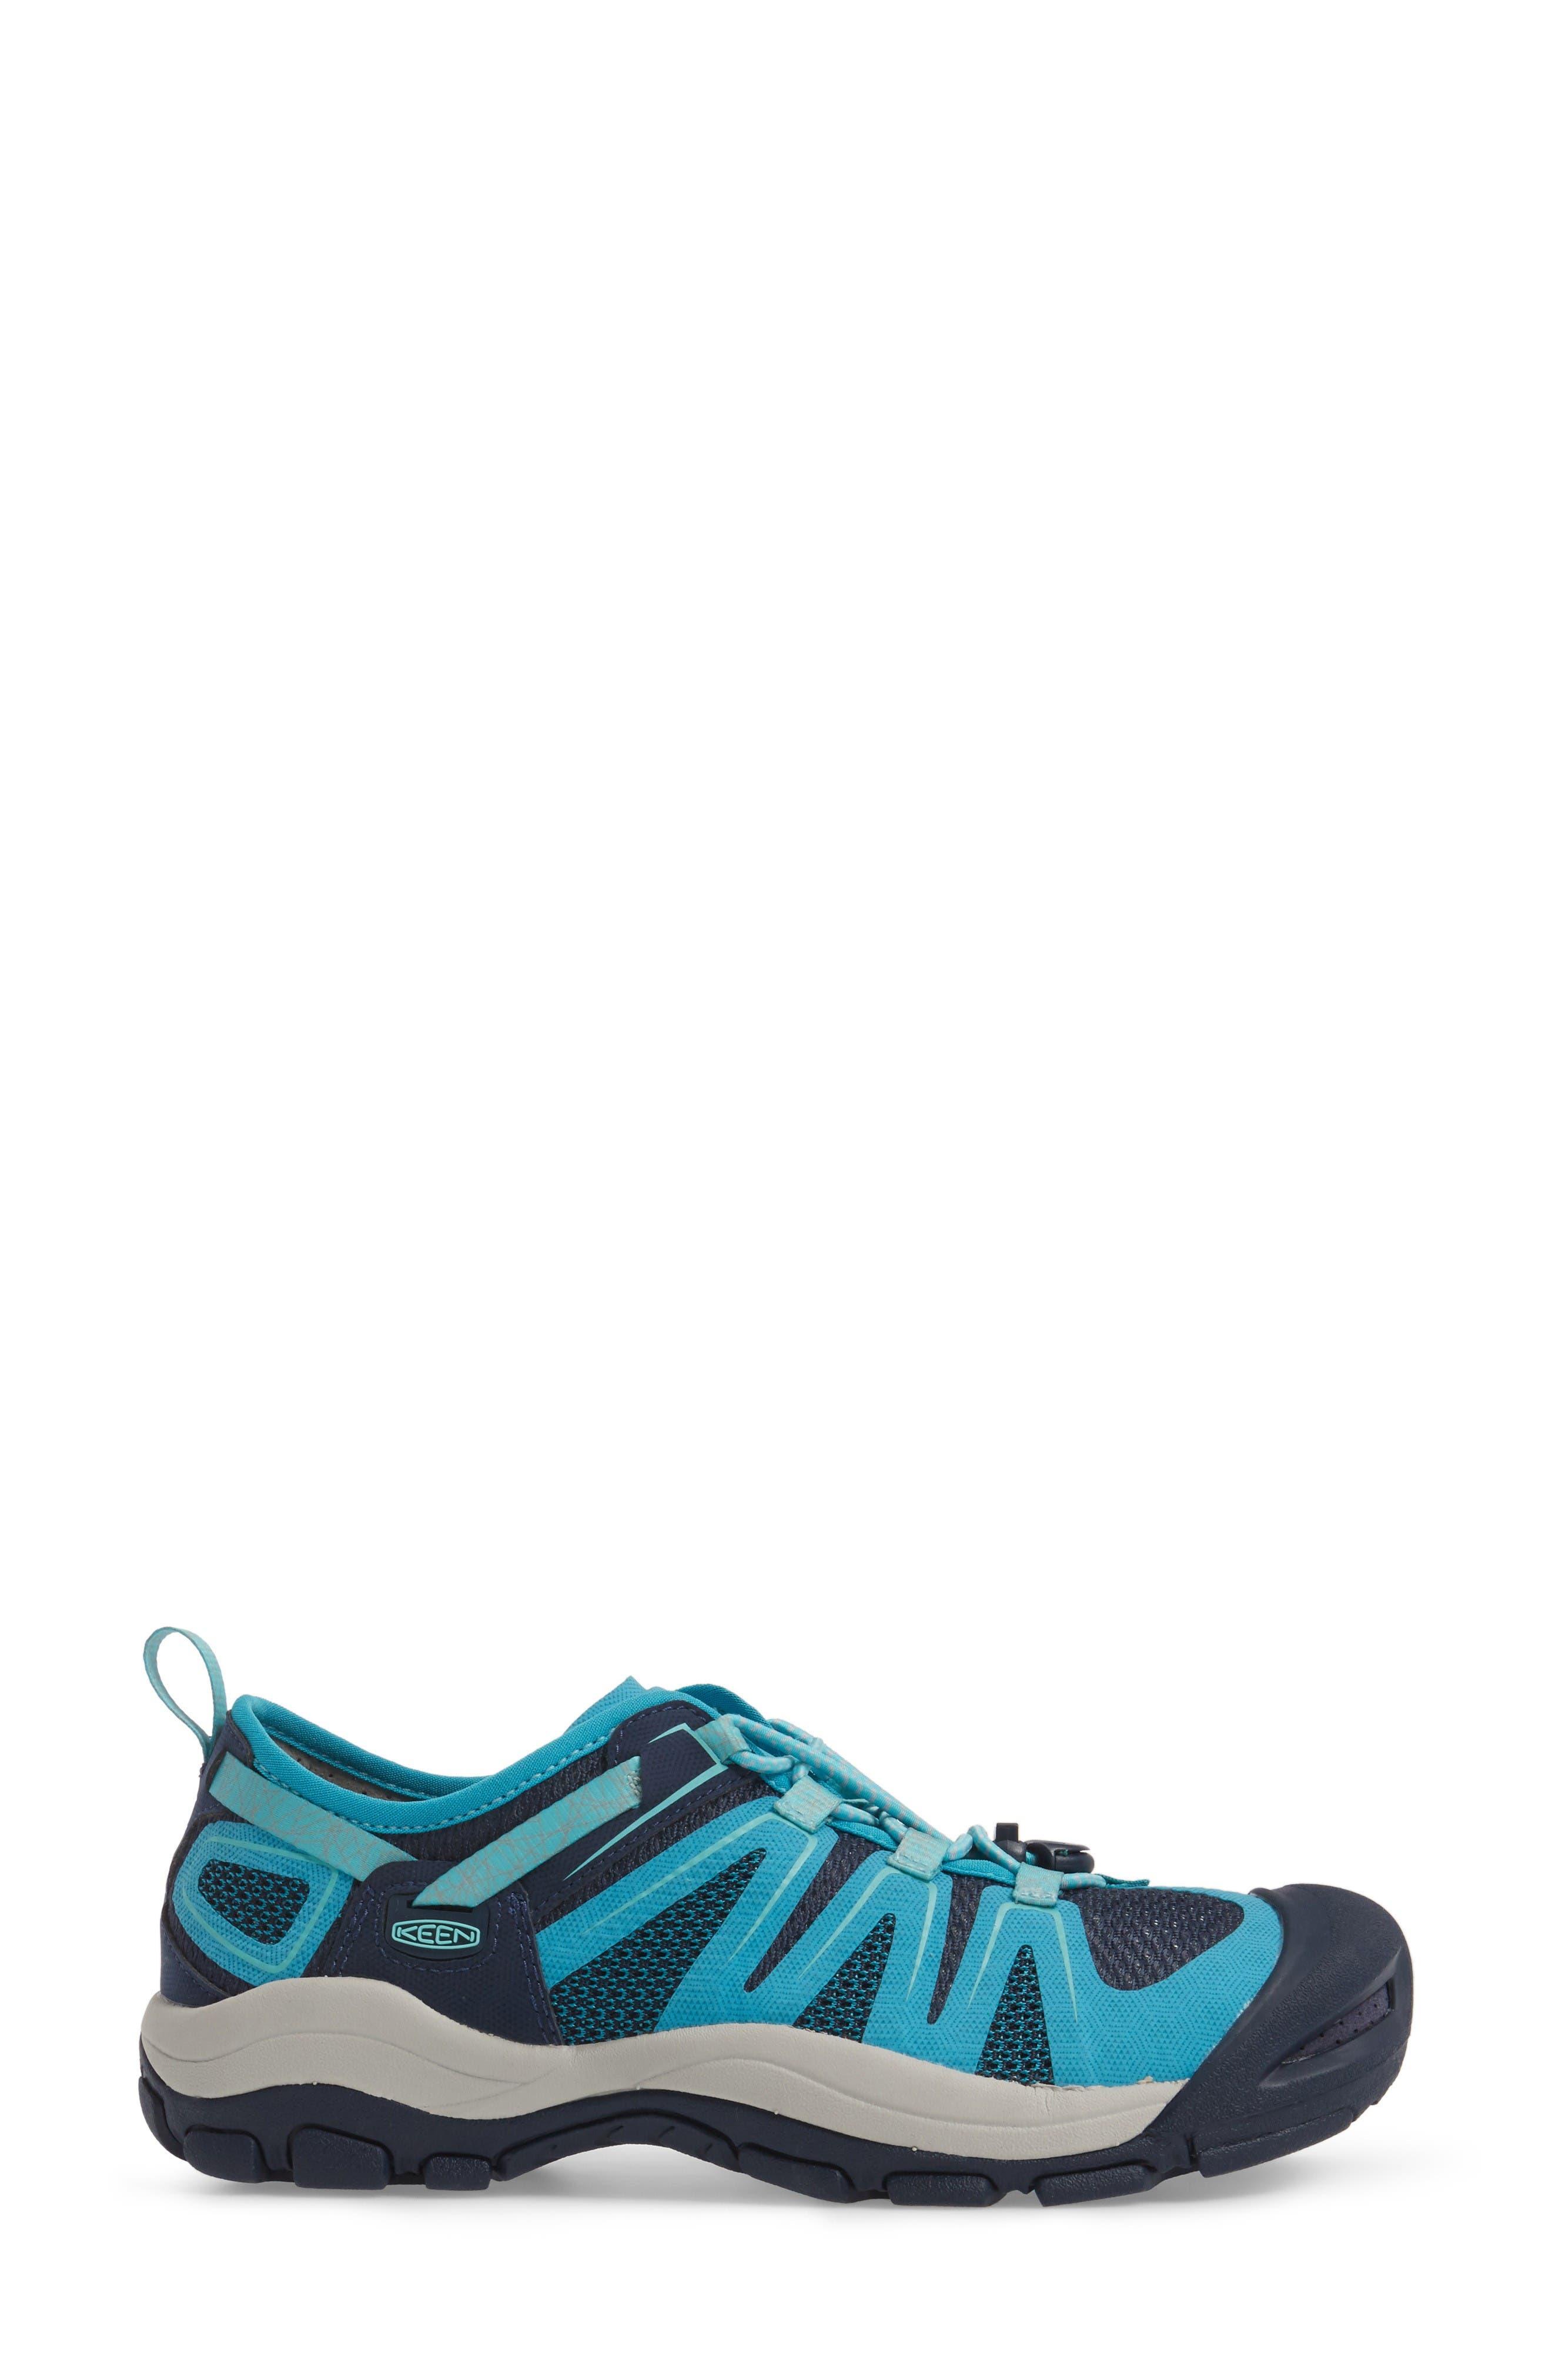 McKenzie II Waterproof Sneaker,                             Alternate thumbnail 3, color,                             Dress Blues/ Algiers Fabric